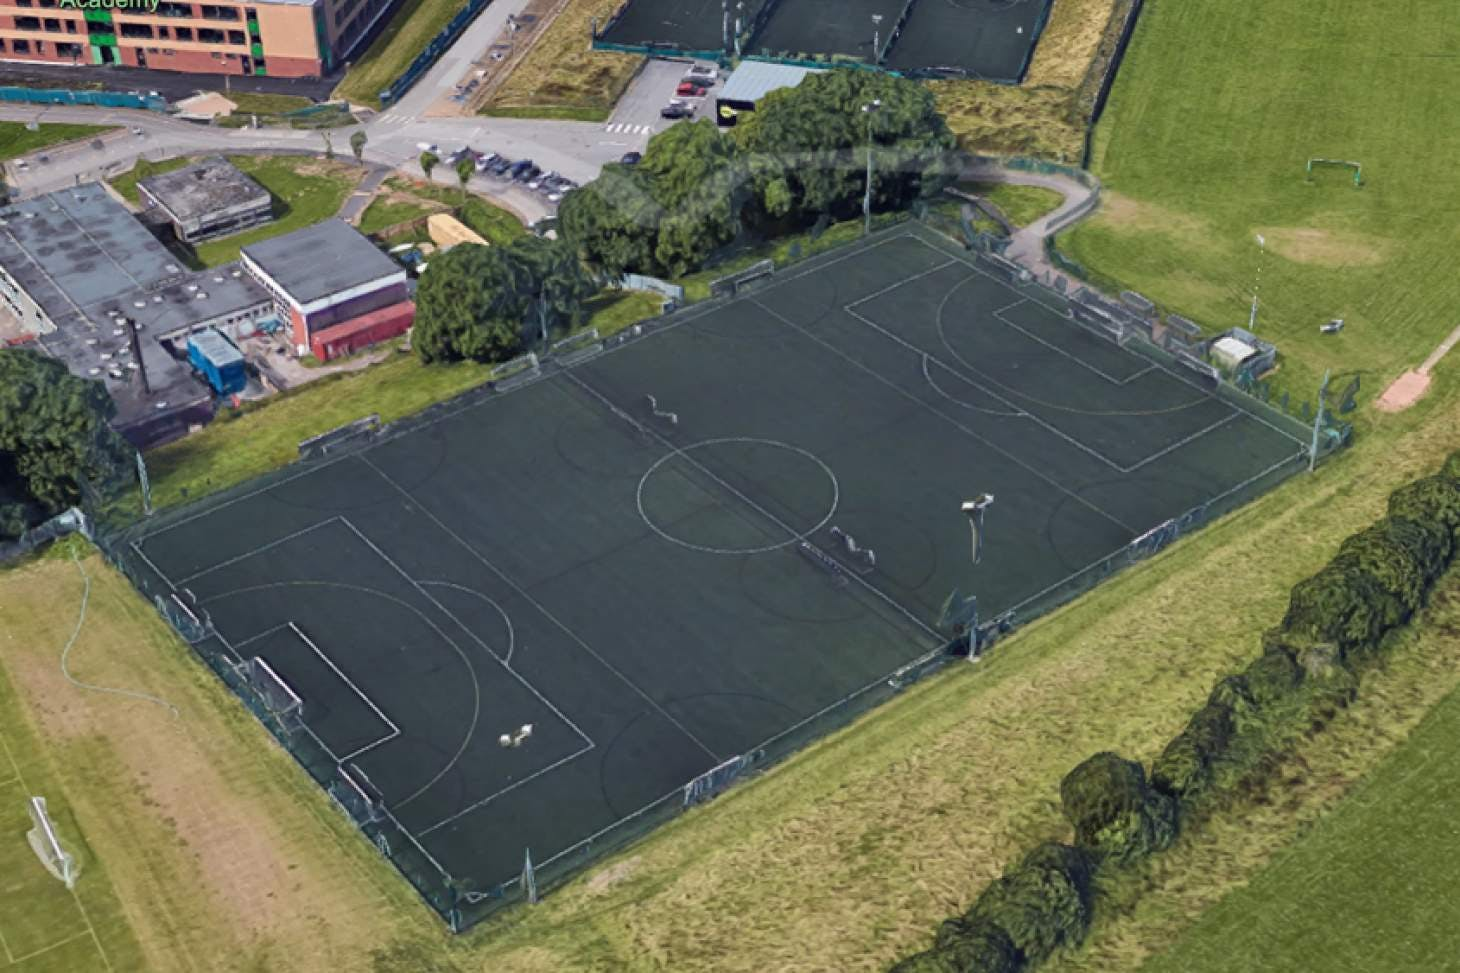 PlayFootball Nottingham 7 a side   3G Astroturf football pitch